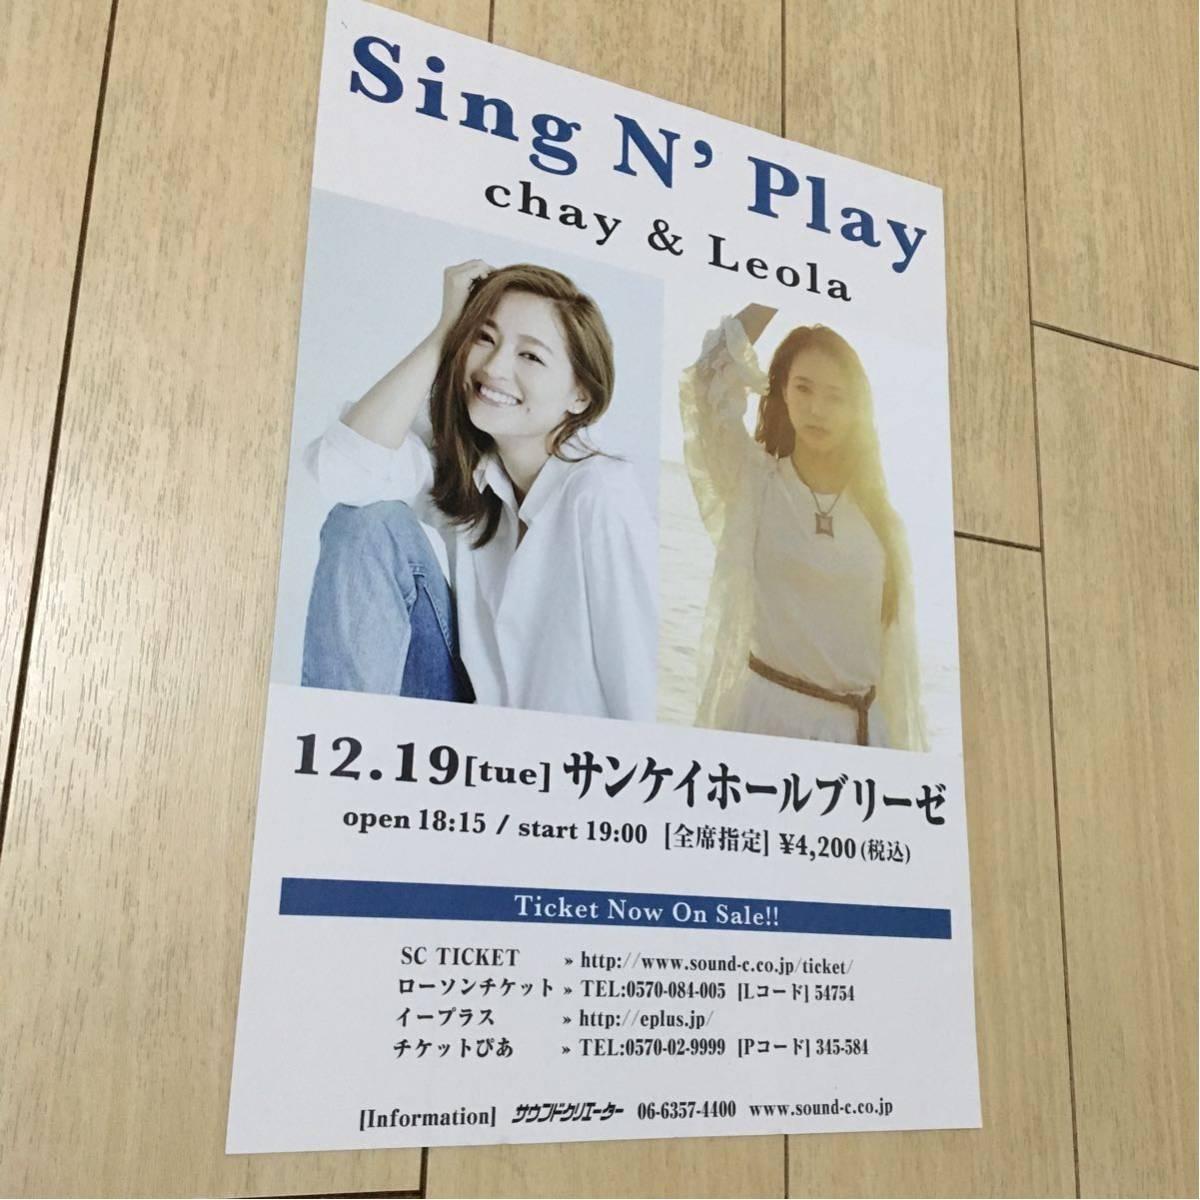 chay & leola ライブ コンサート 告知 チラシ 大阪 サンケイホール ブリーゼ 2017 チャイ sing n' play